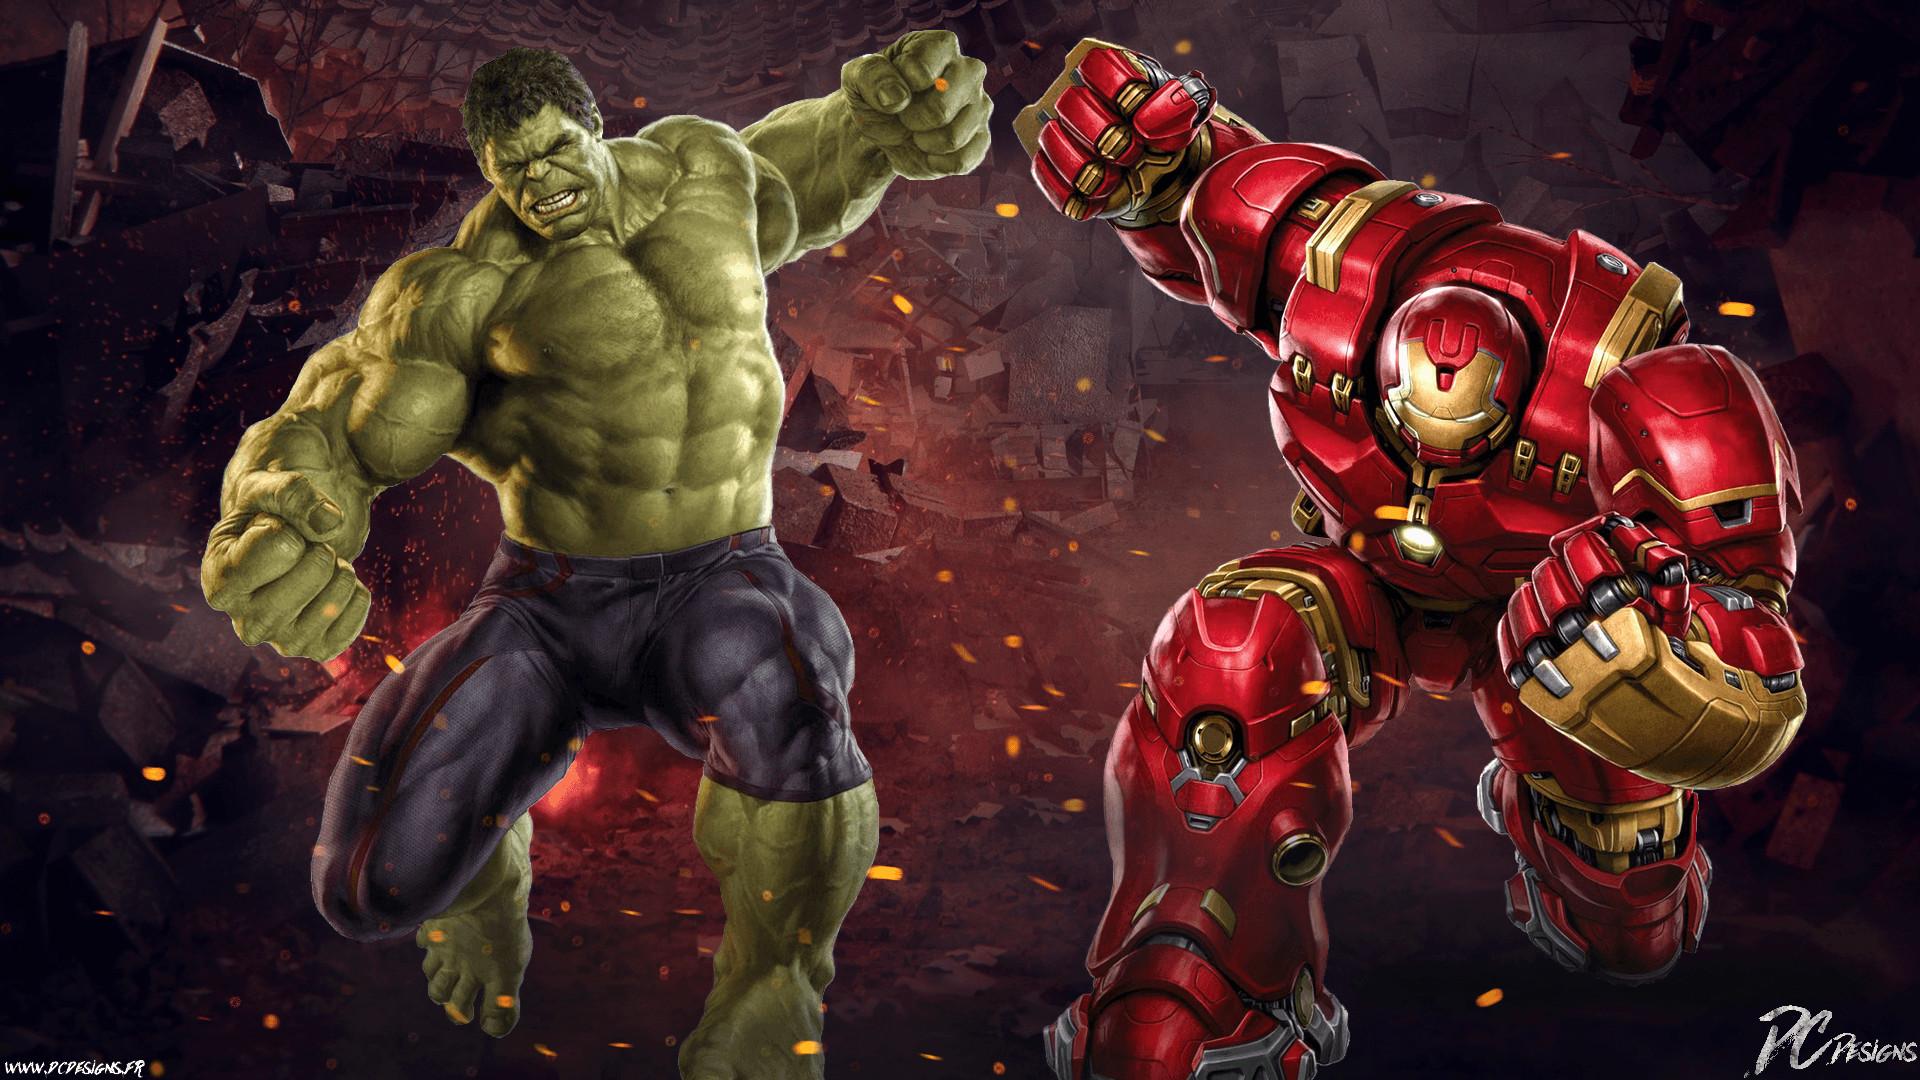 1 Hulk Vs Hulkbuster HD Wallpapers | Backgrounds – Wallpaper Abyss